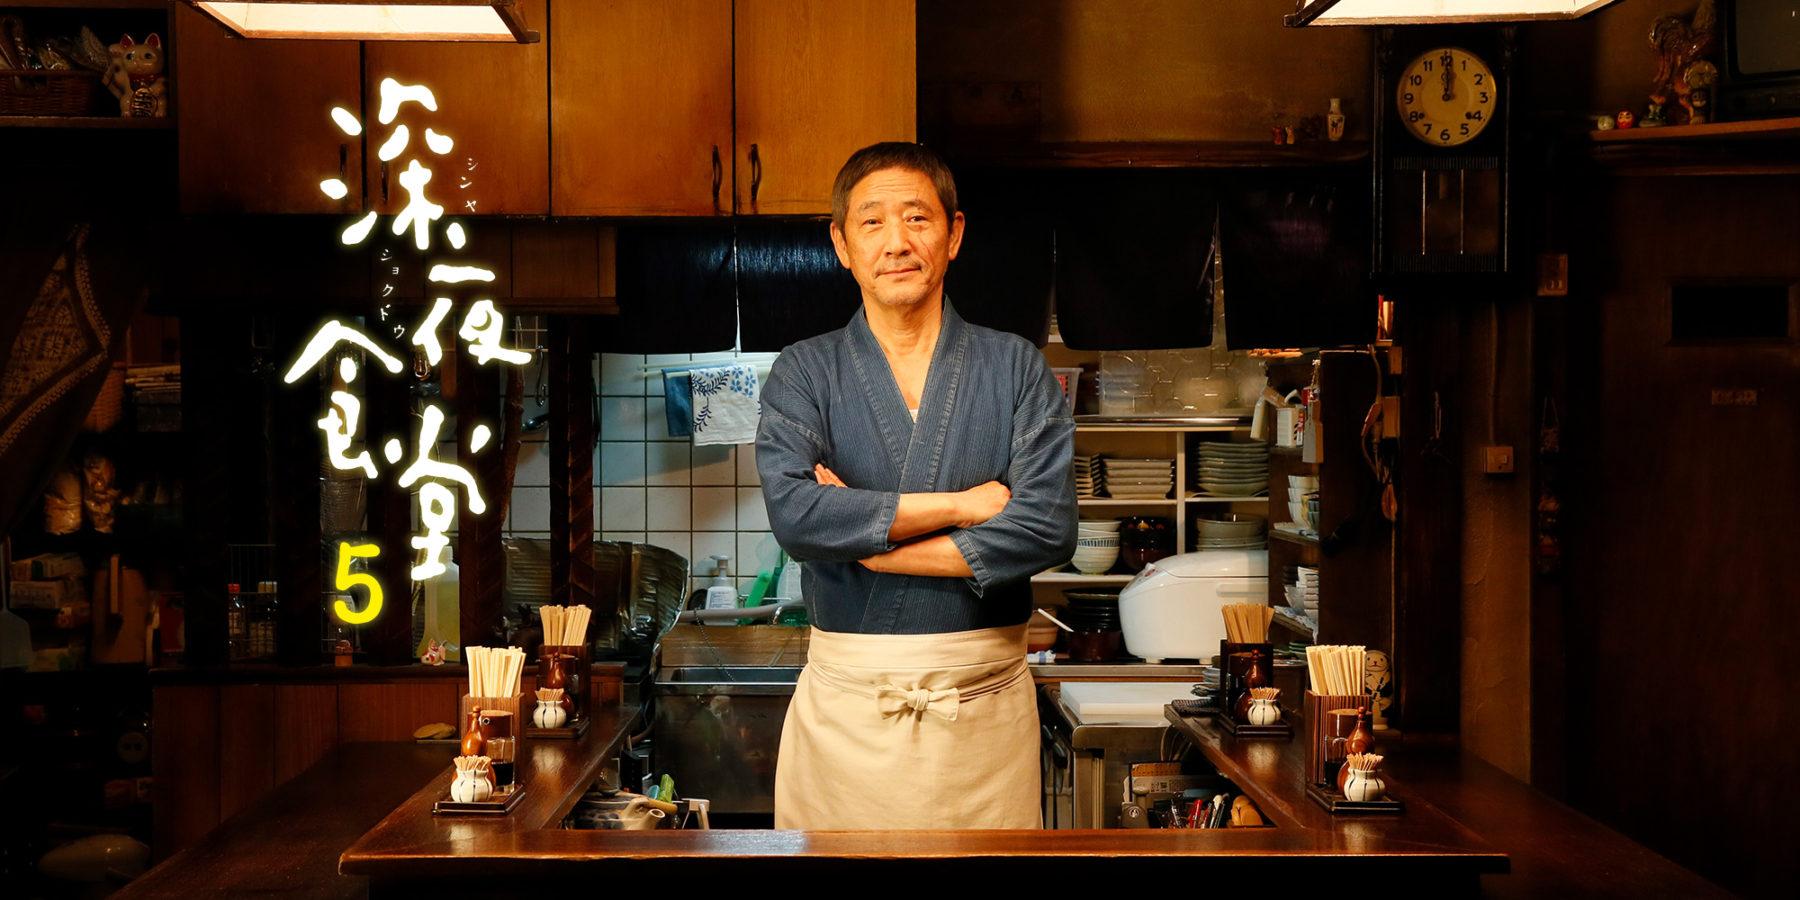 深夜食堂 -Tokyo Stories Season2-/深夜食堂 第五部